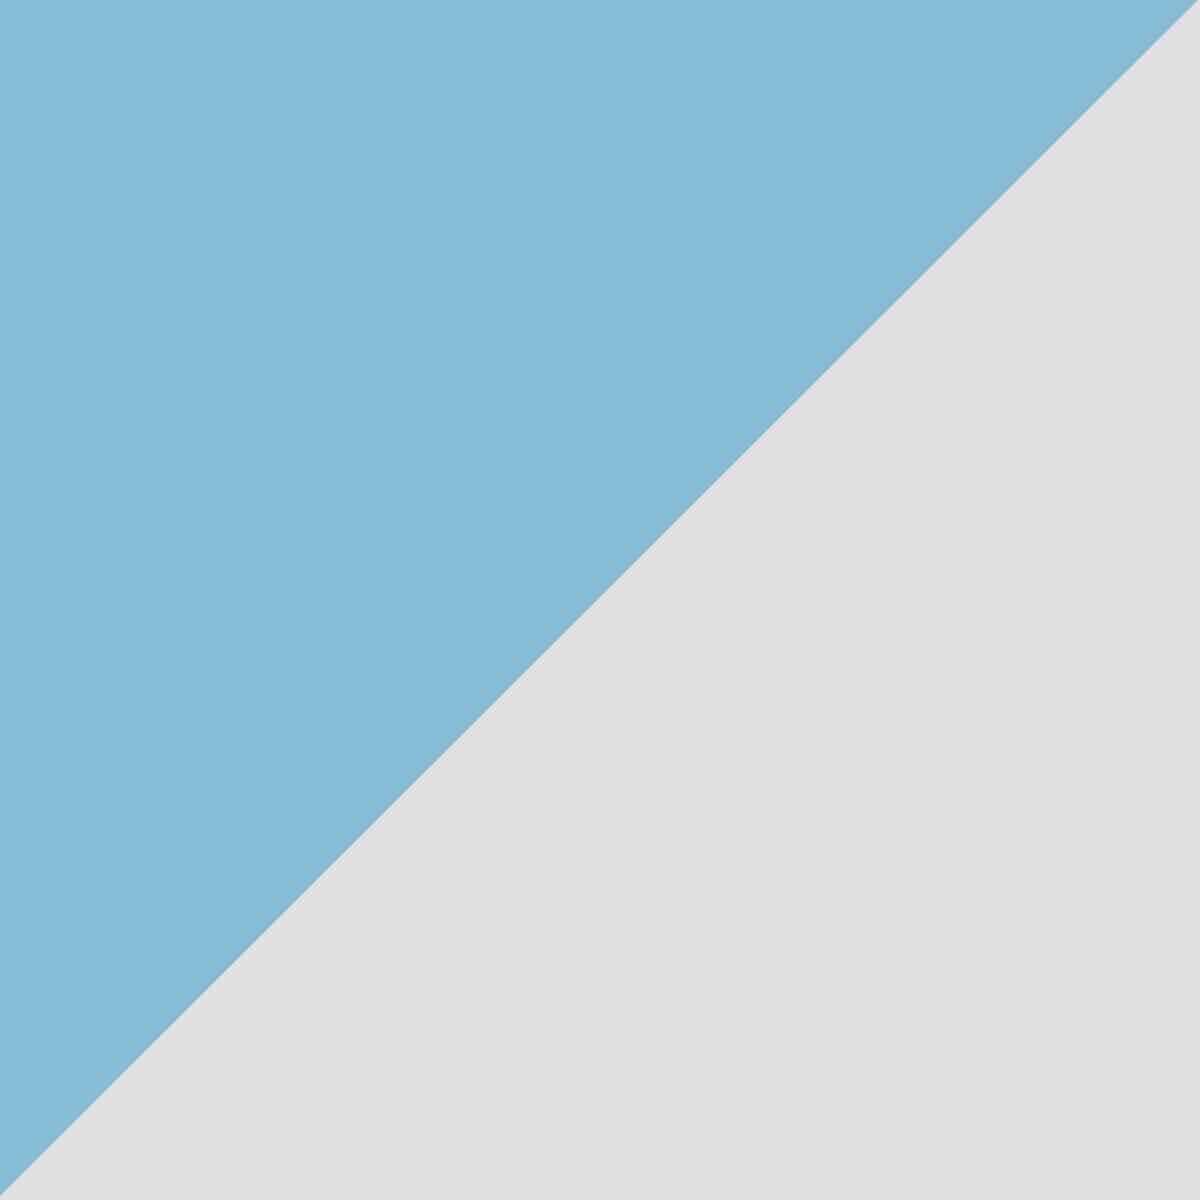 Bleu/Argent